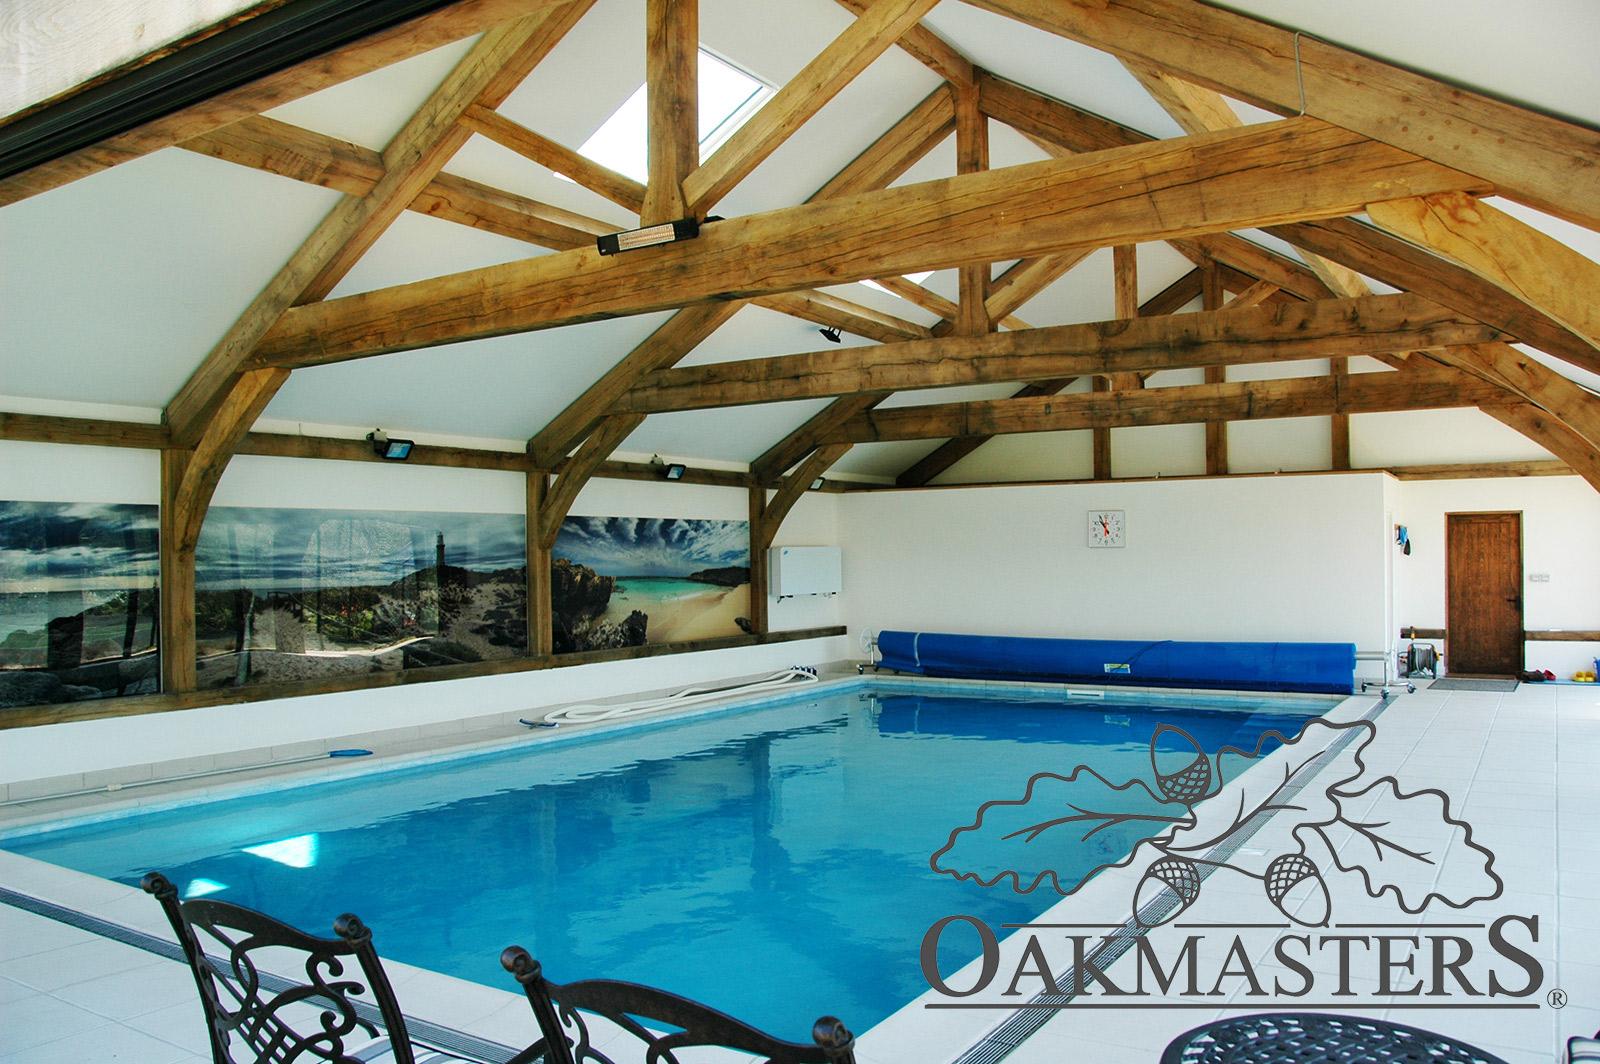 Case study: An oak framed pool house that brings joy all year round